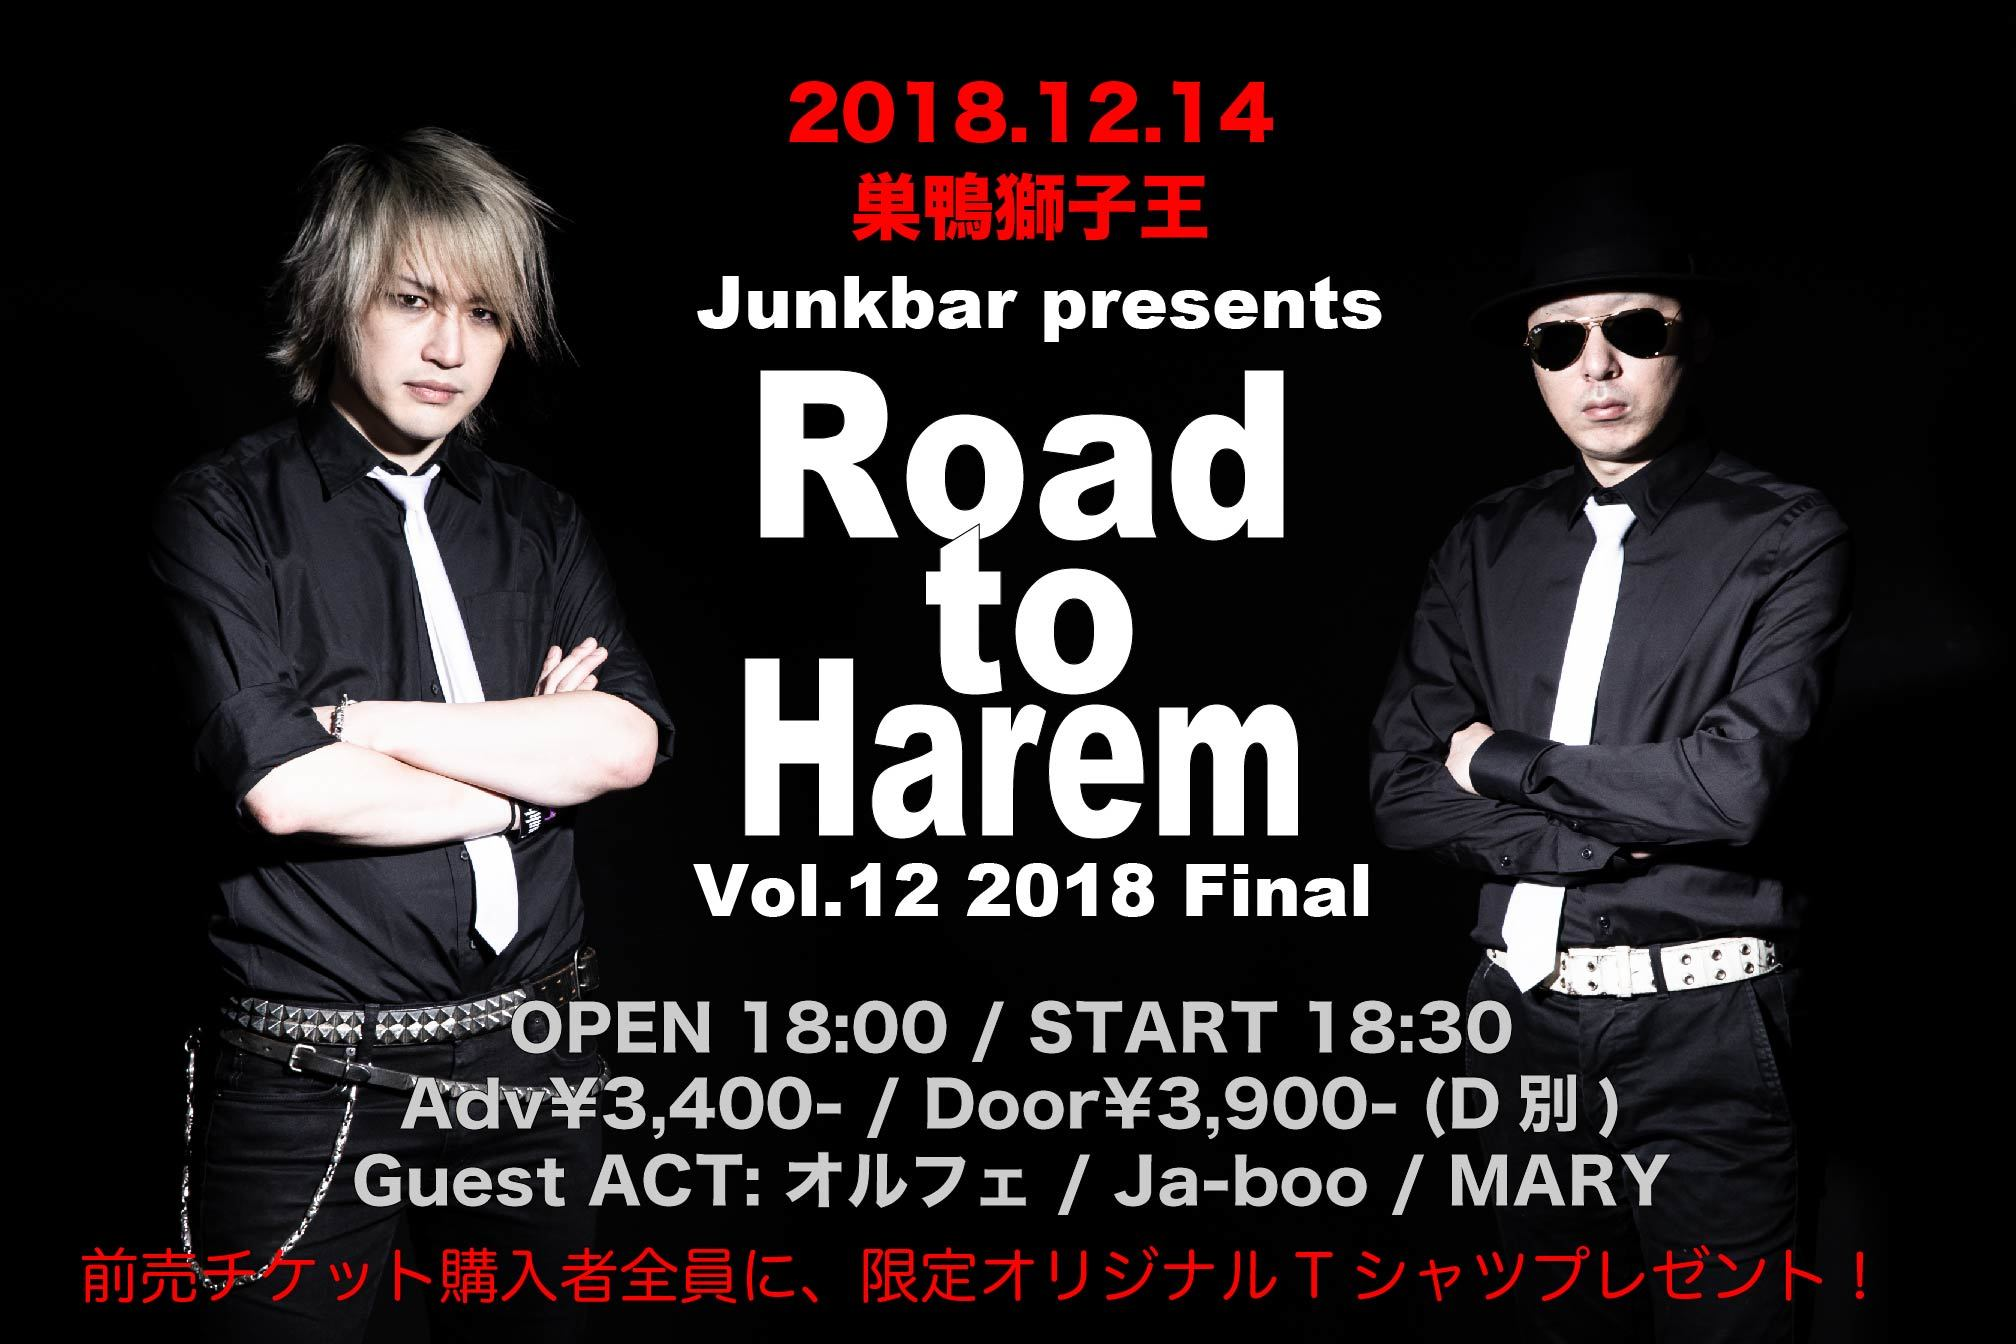 Junkbar / ライブチケット